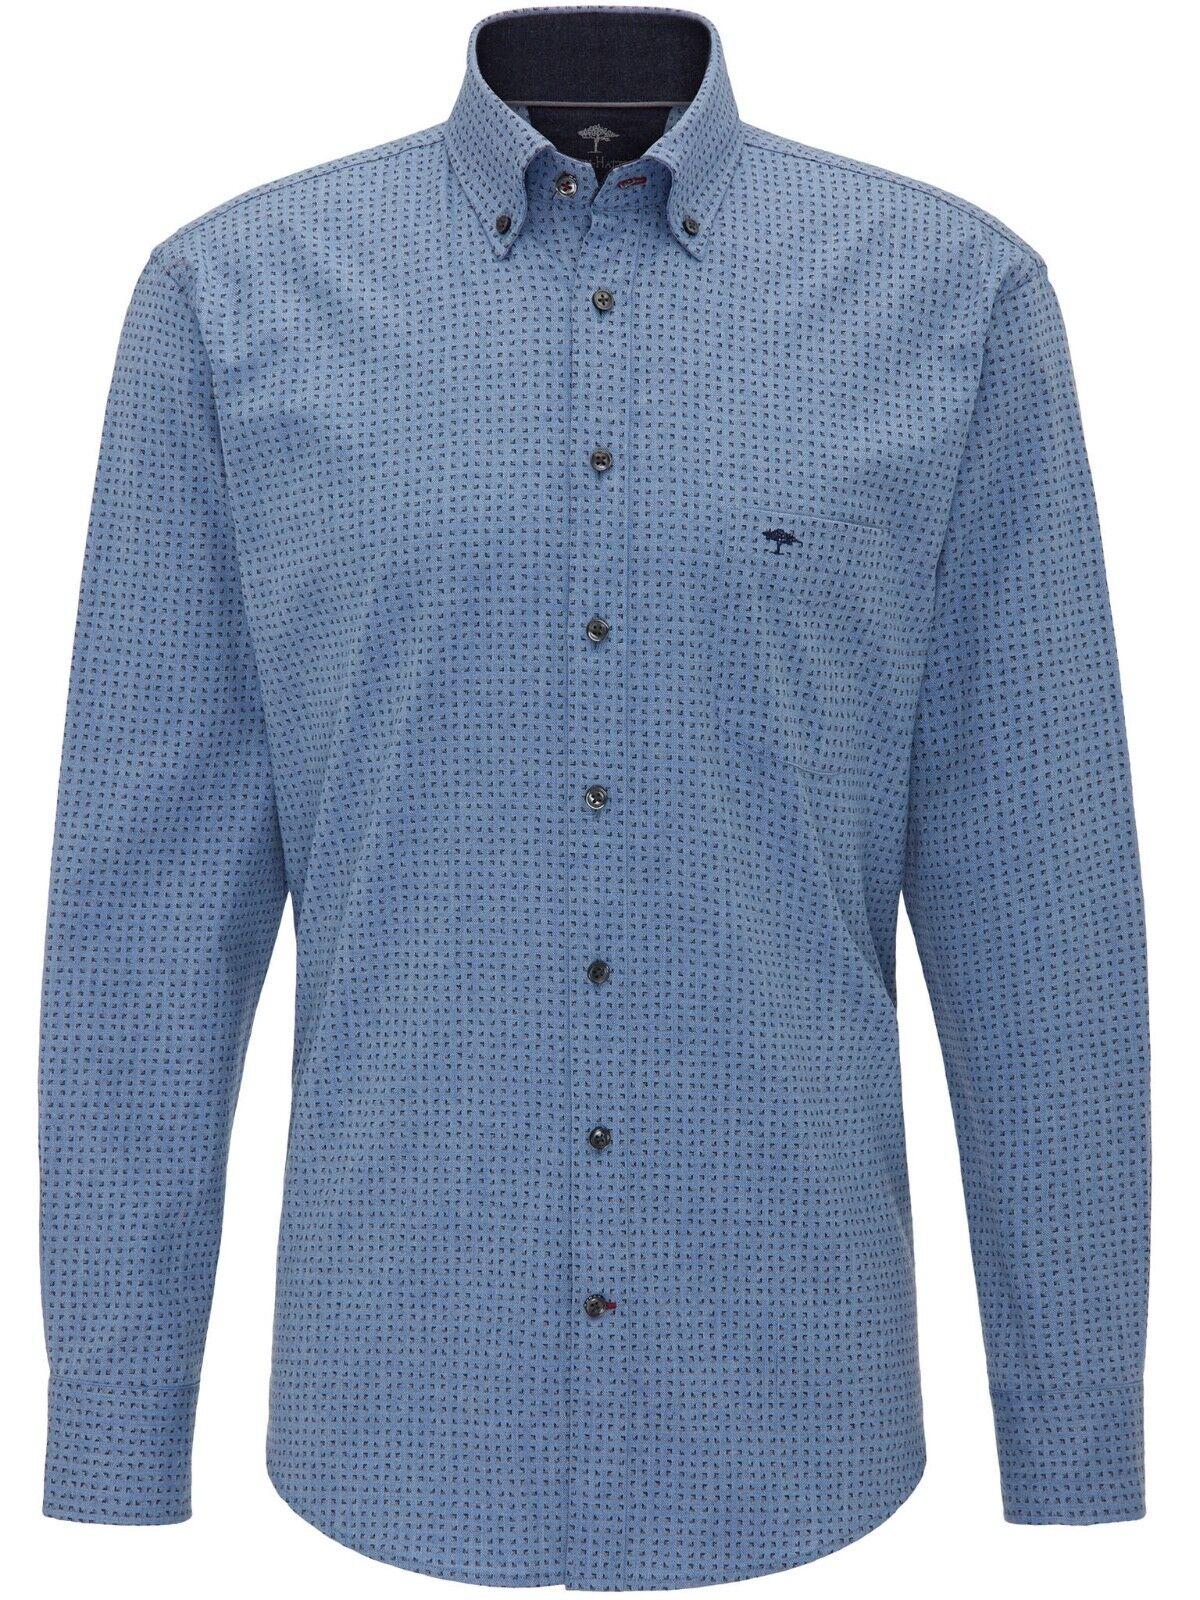 FYNCH-HATTON® Light Print Flannel Shirt Ice bluee - Medium SALE AW18